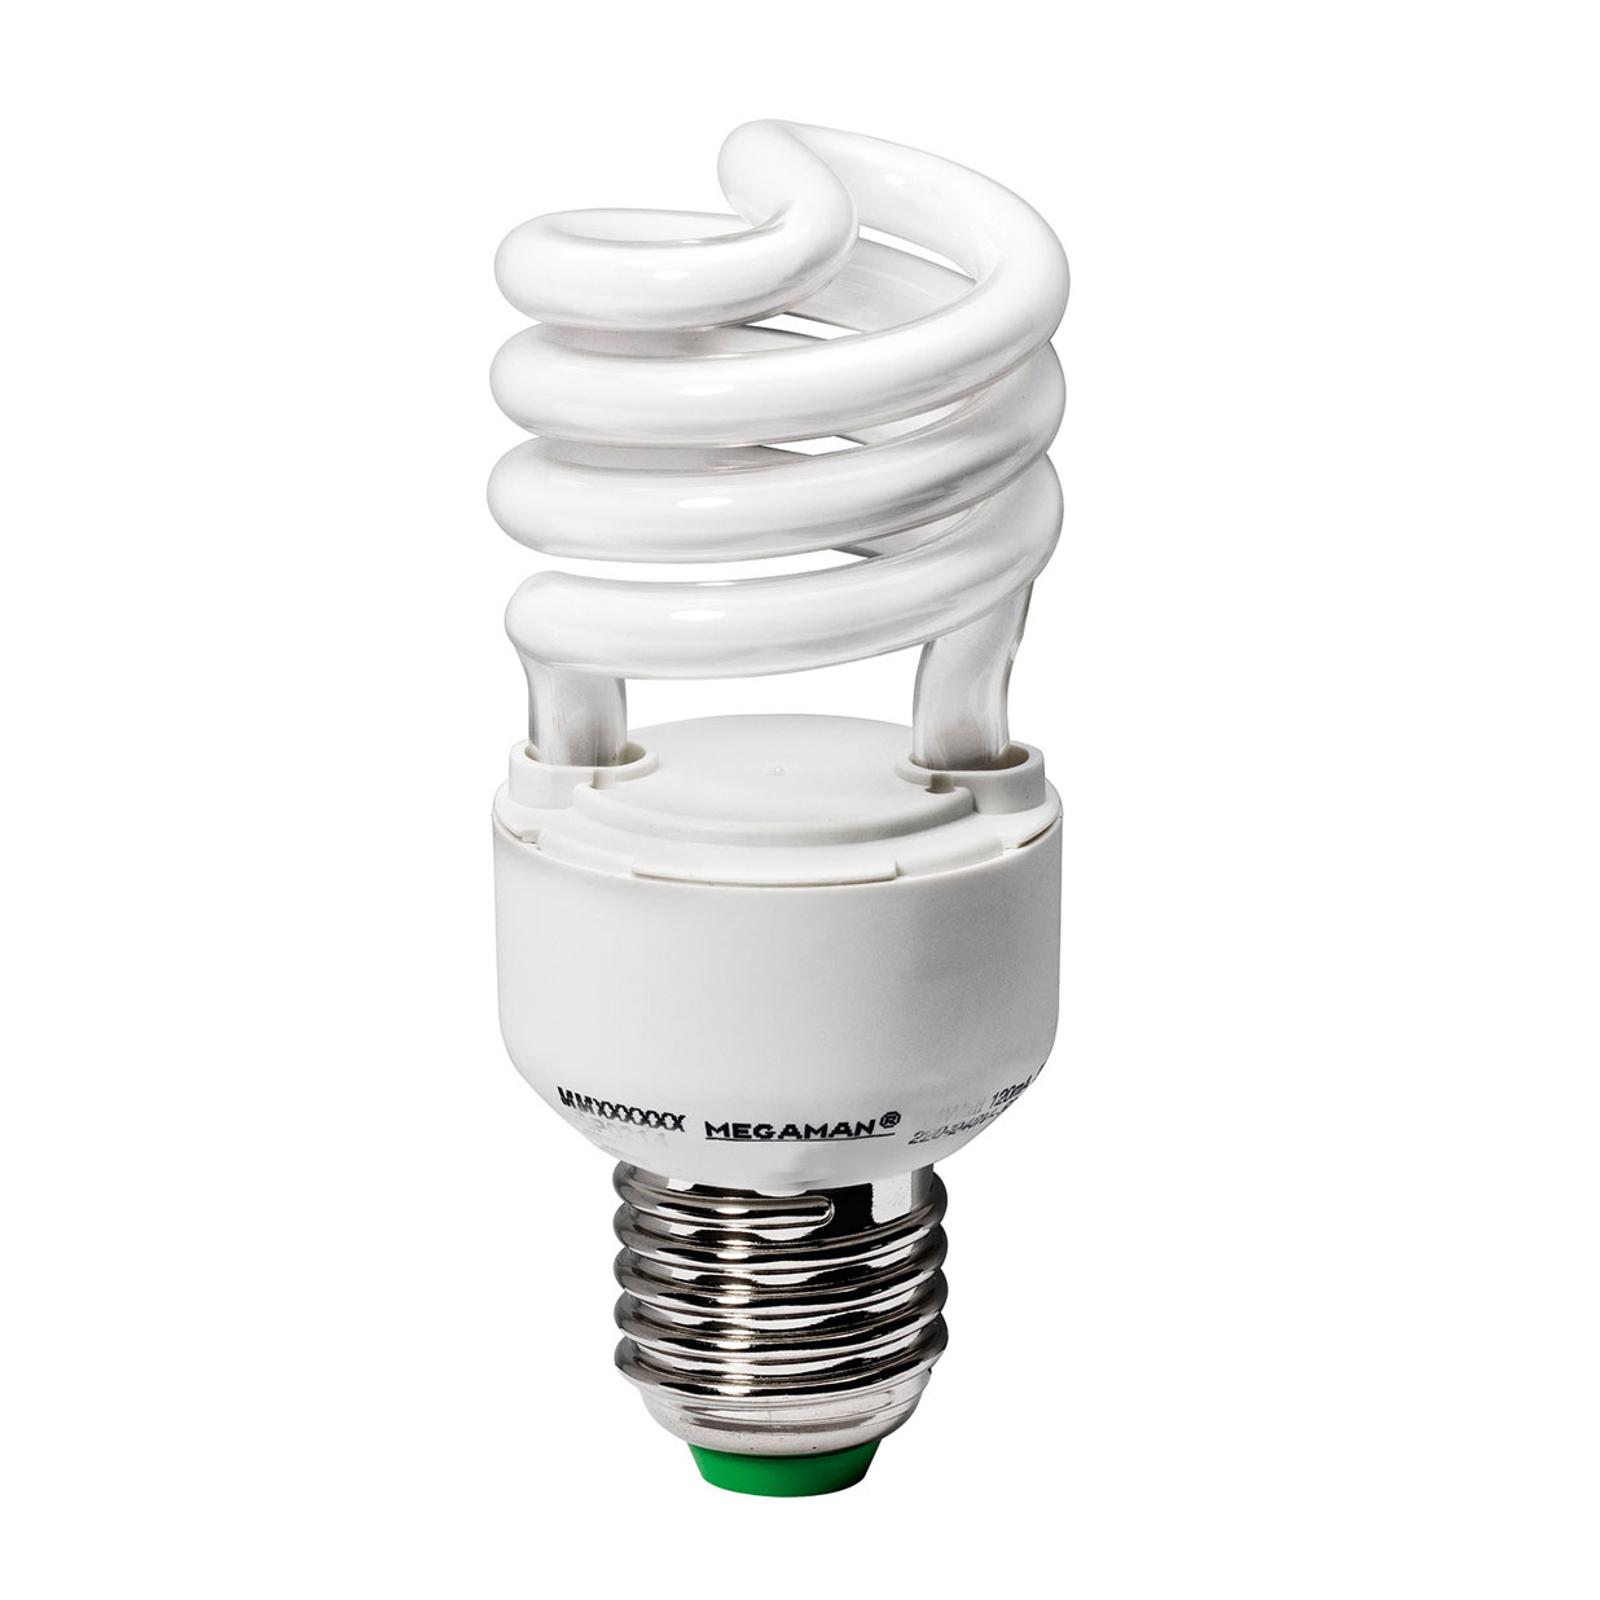 E27 14W Växtlampa - Energisparlampa